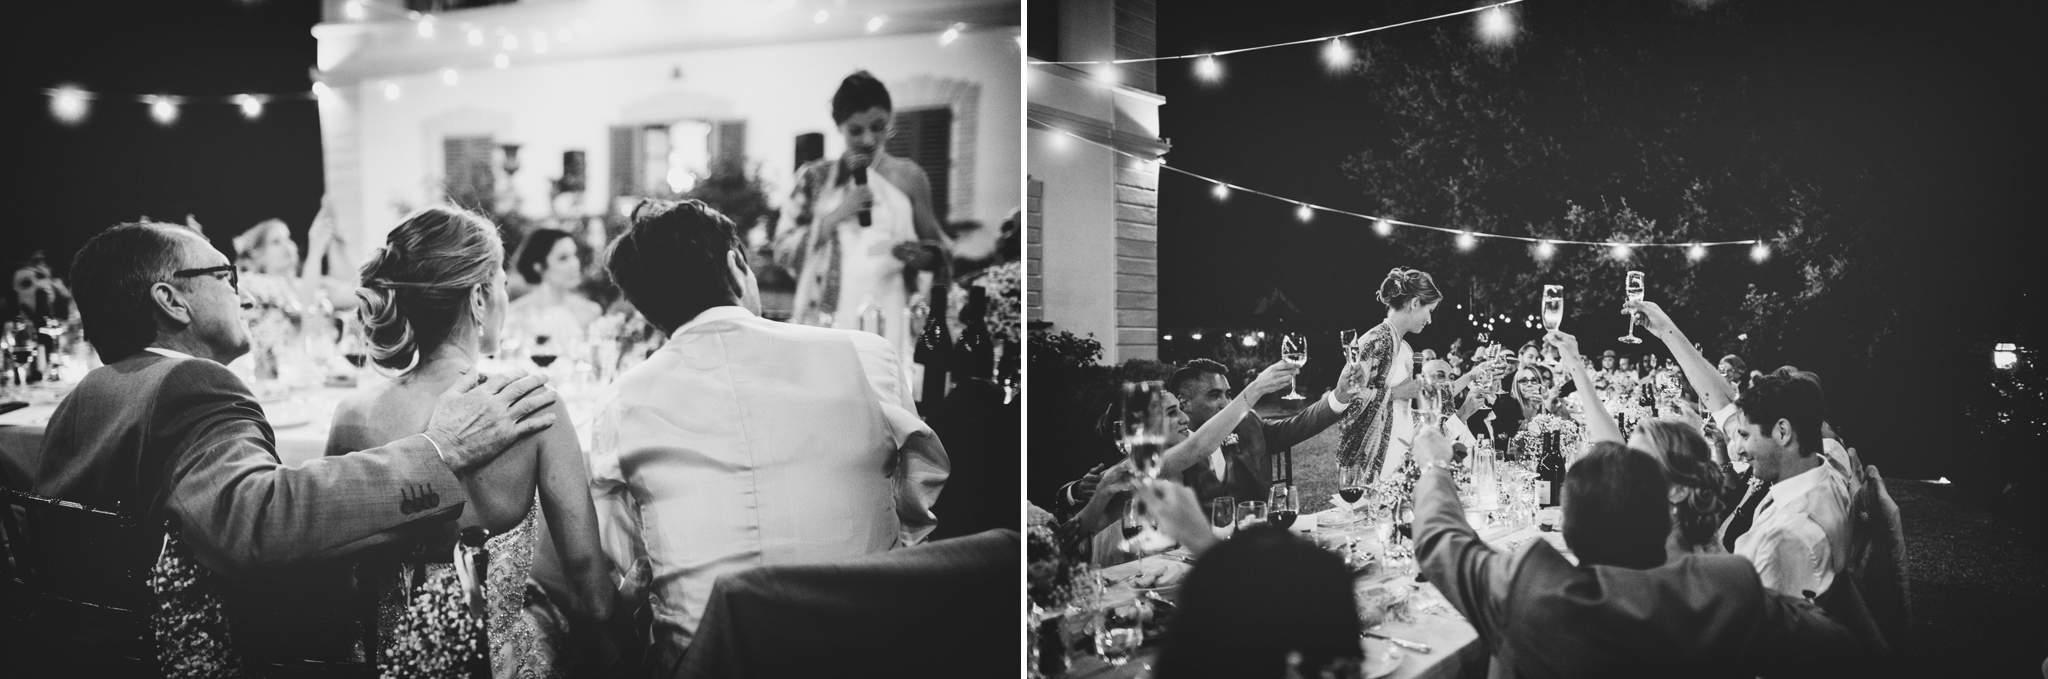 40fotografo-matrimonio-toscana-villa-teresa